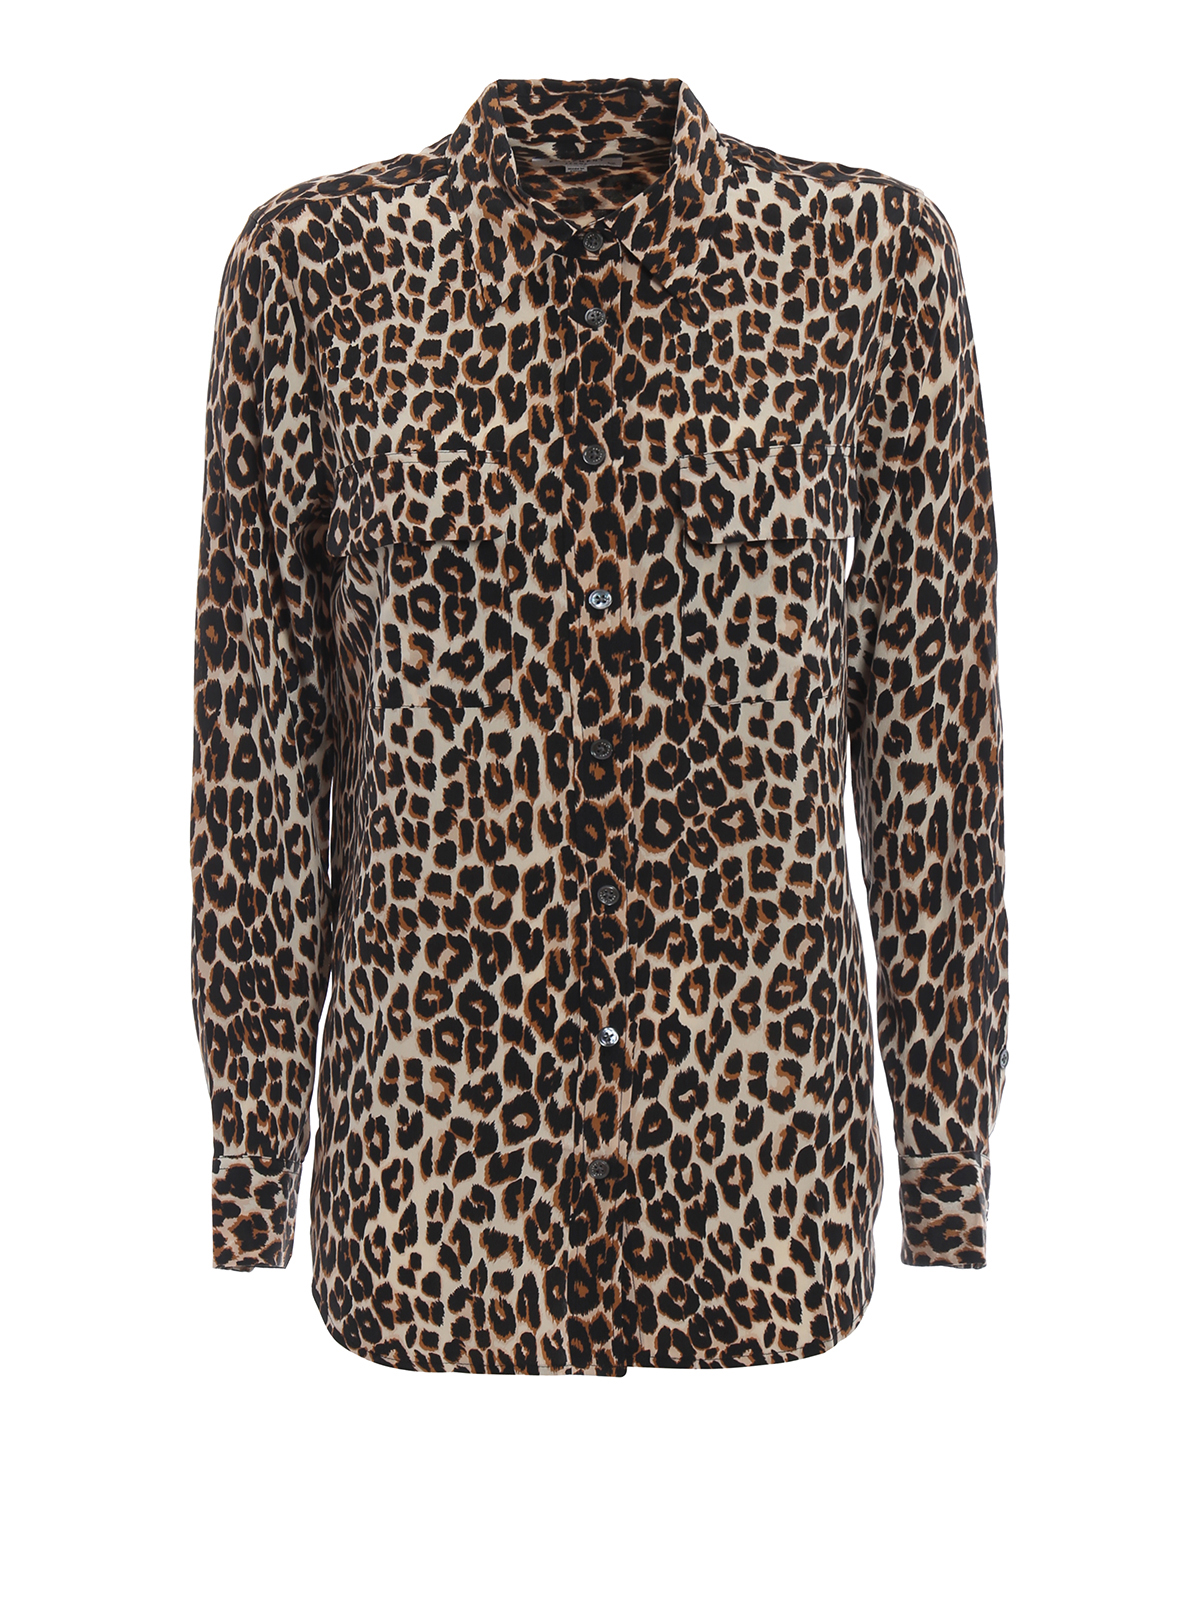 ed8852c51fe2 Equipment - Slim Signature animal print silk shirt - shirts - Q588 E231